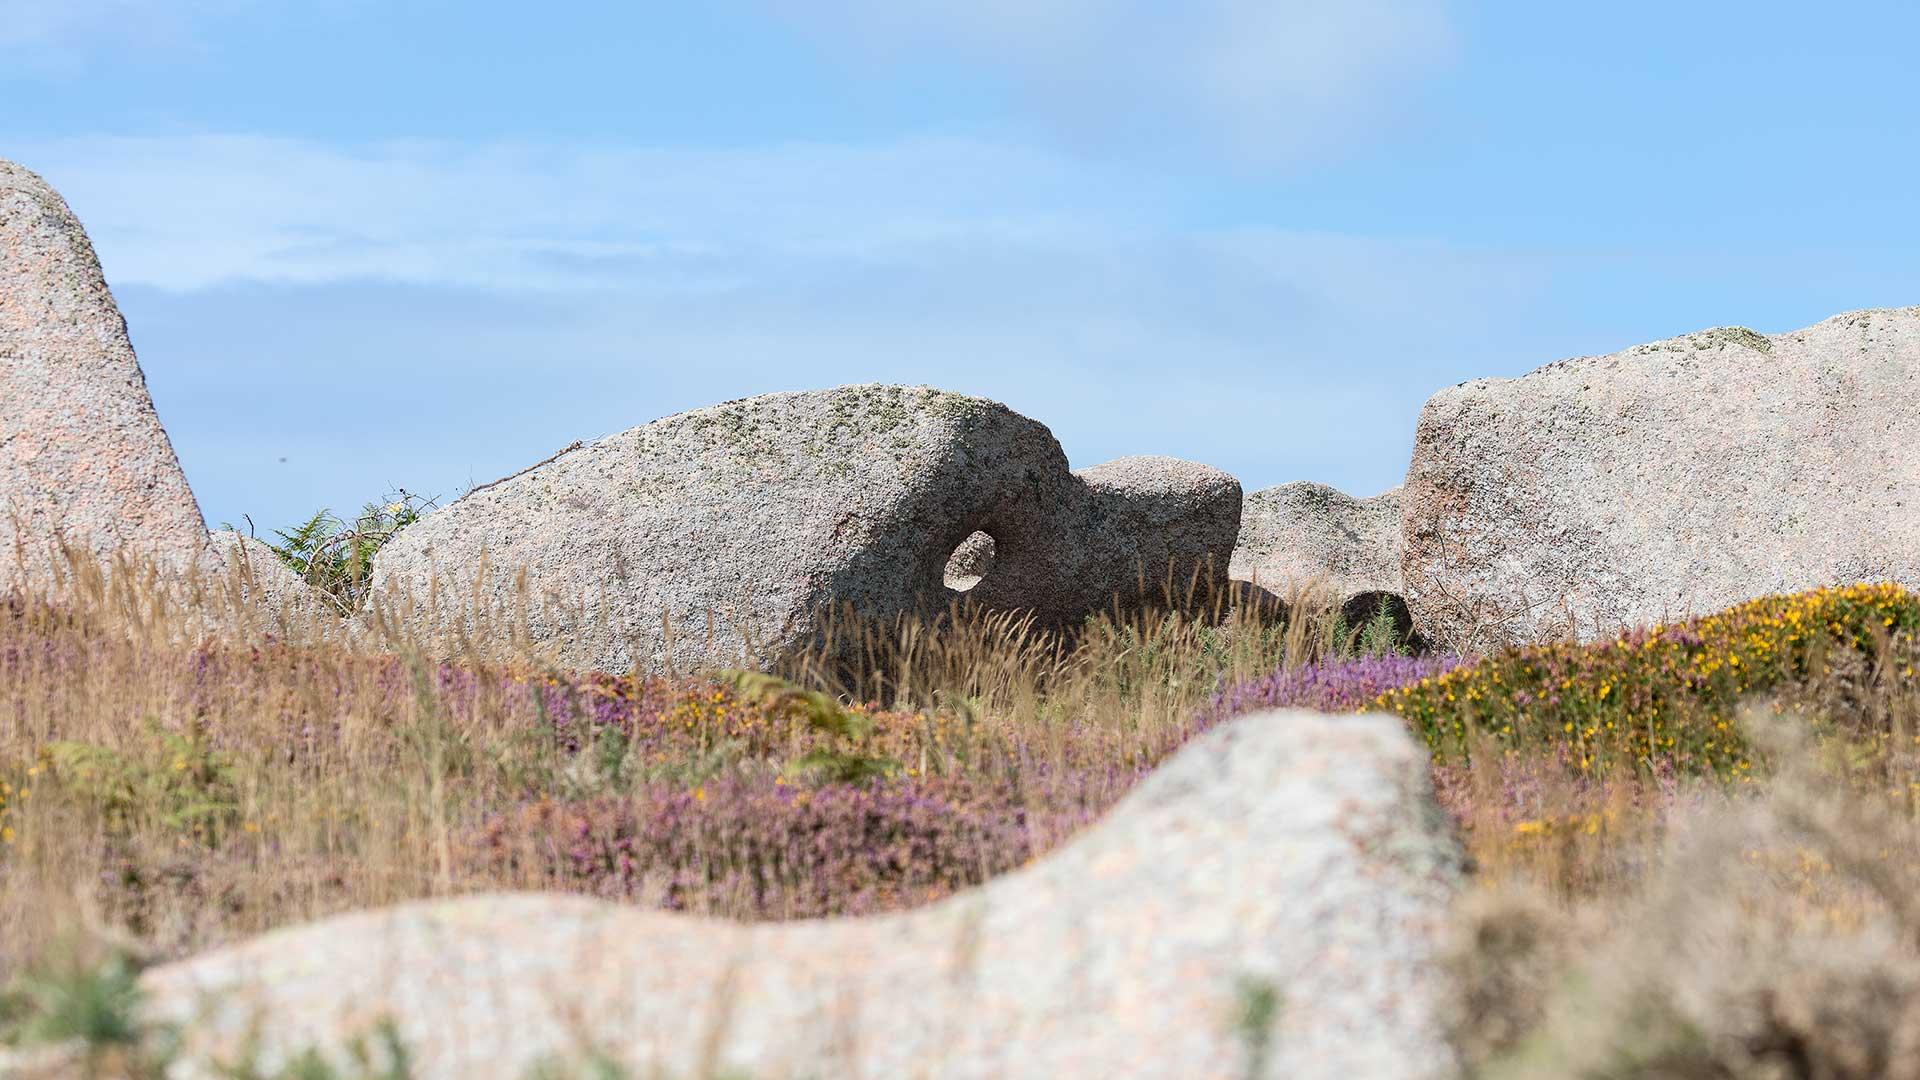 Landschaftsfotografie: Côte de Granit Rose – Felsen mit Loch | Foto: Dieter Eikenberg, imprints